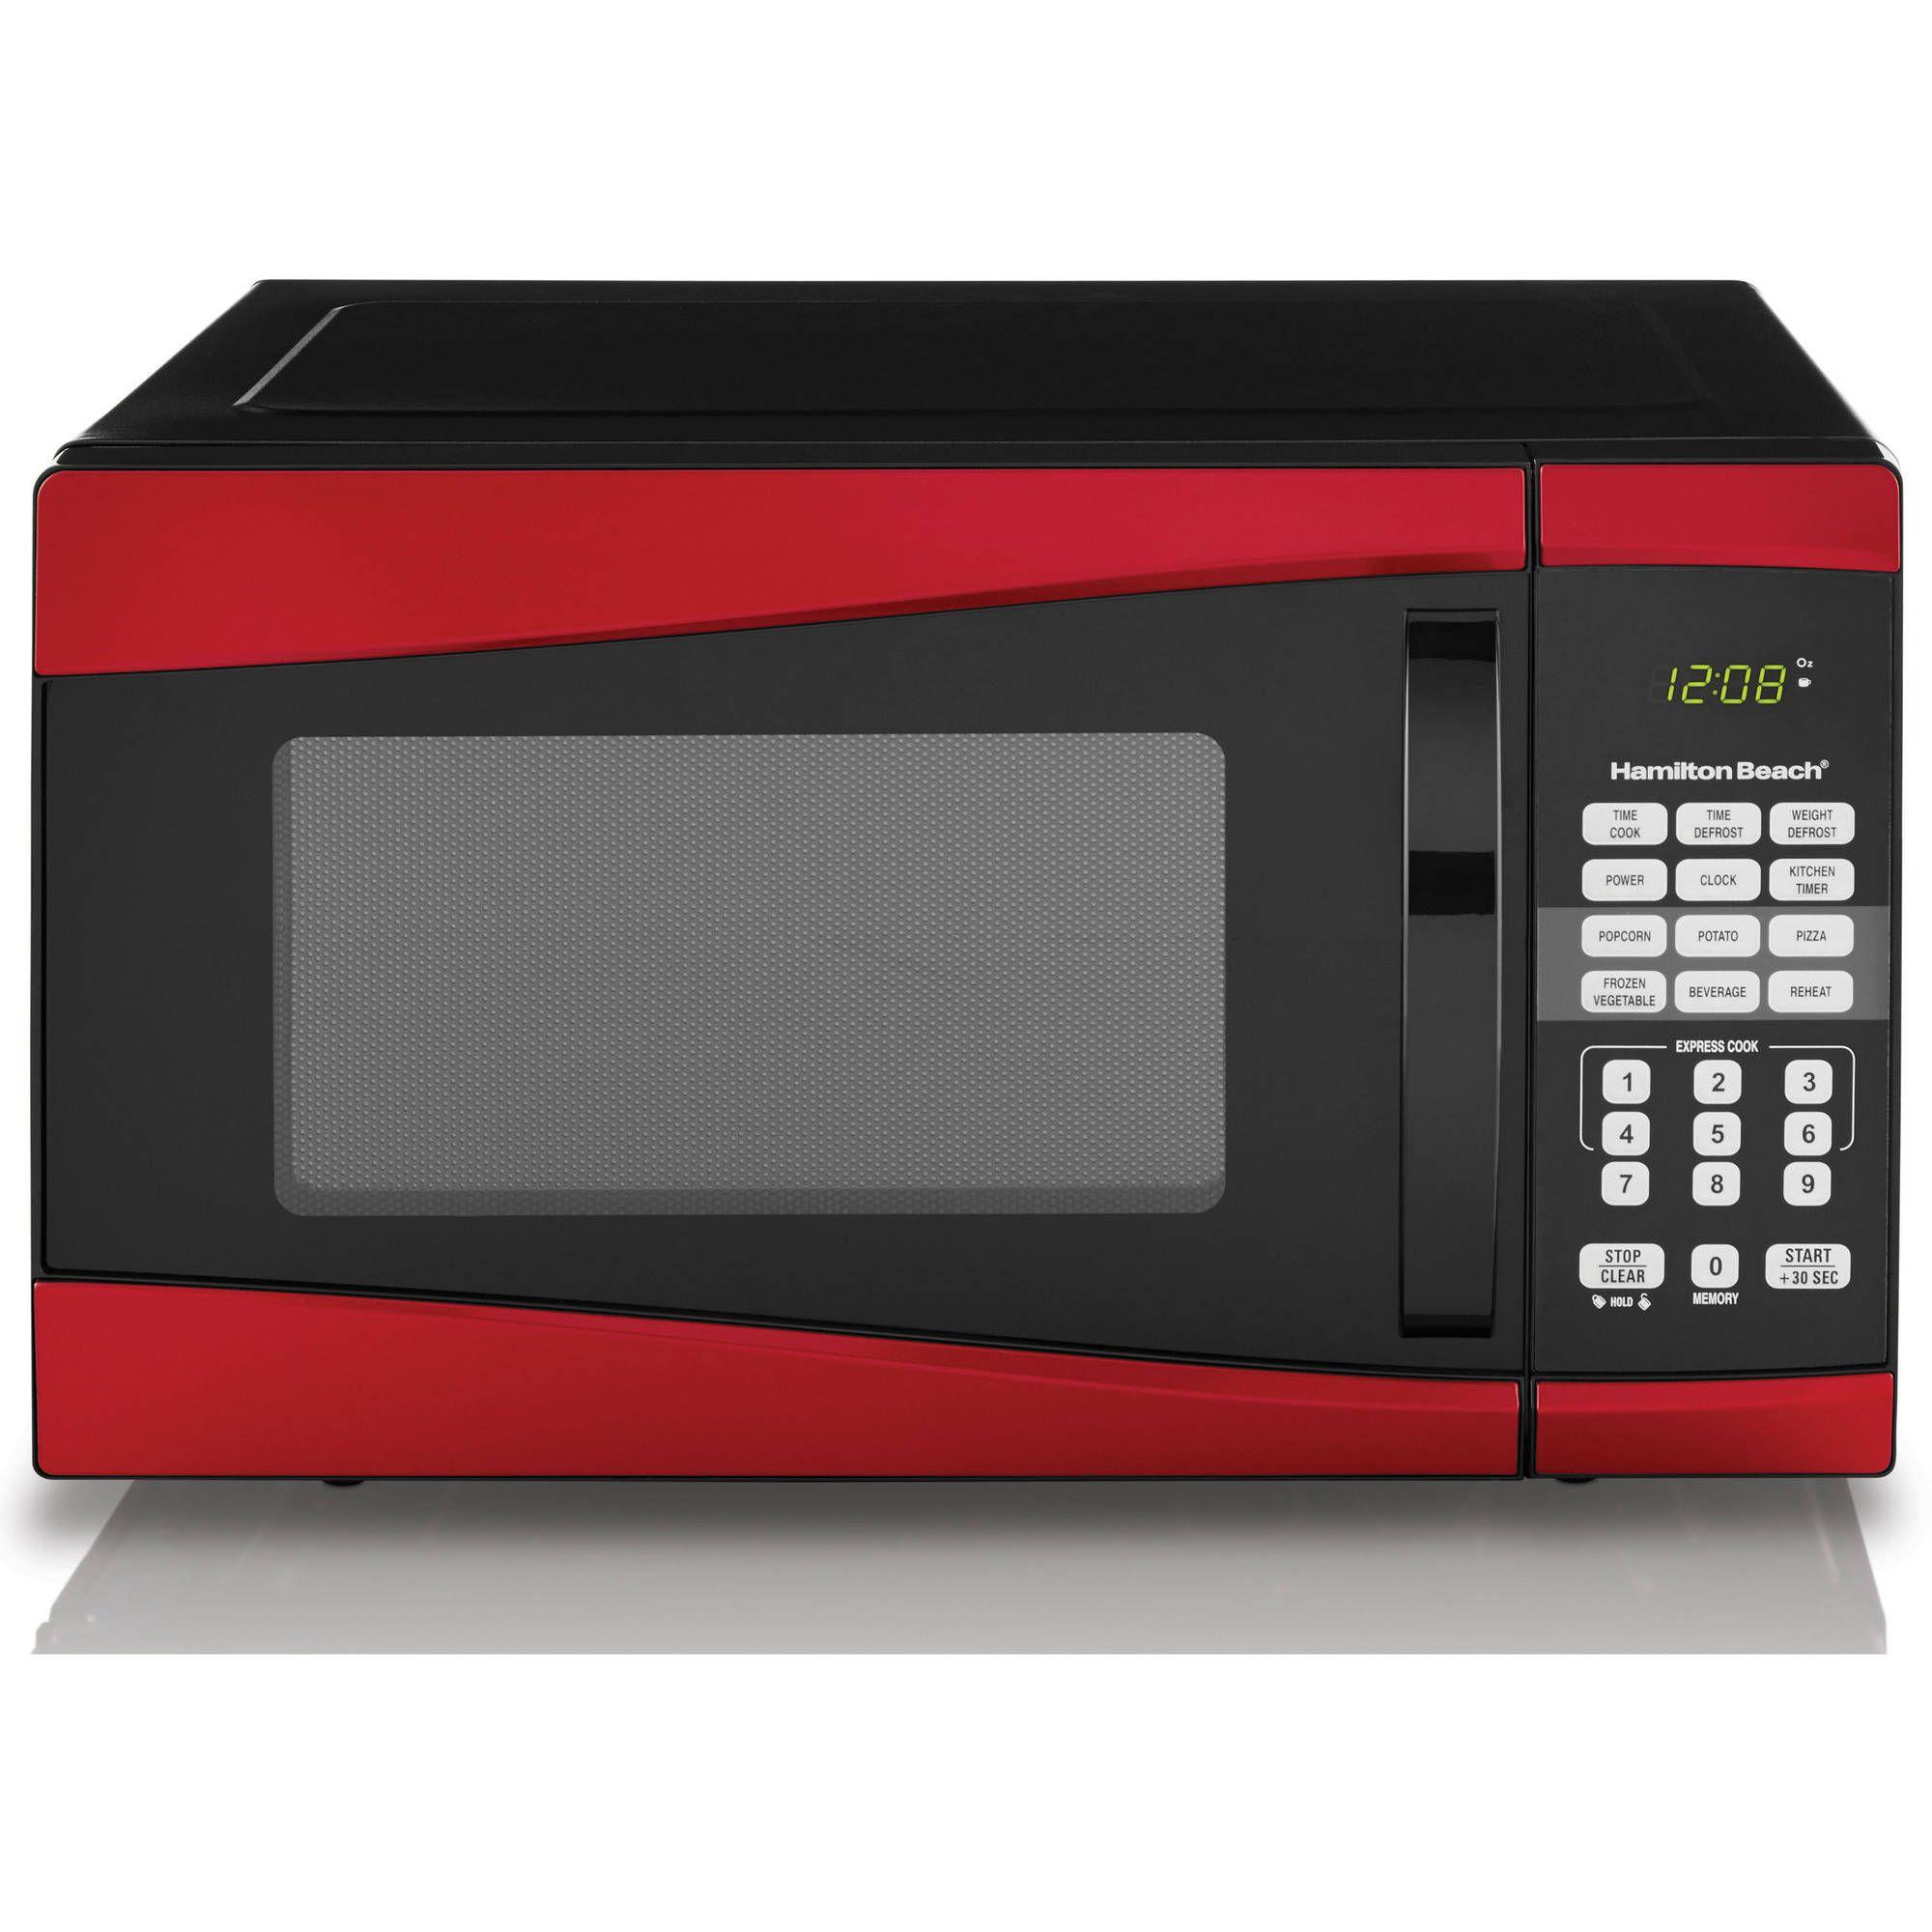 Hamilton Beach 0 9 Cu Ft 900w Stainless Steel Microwave Ad Cu